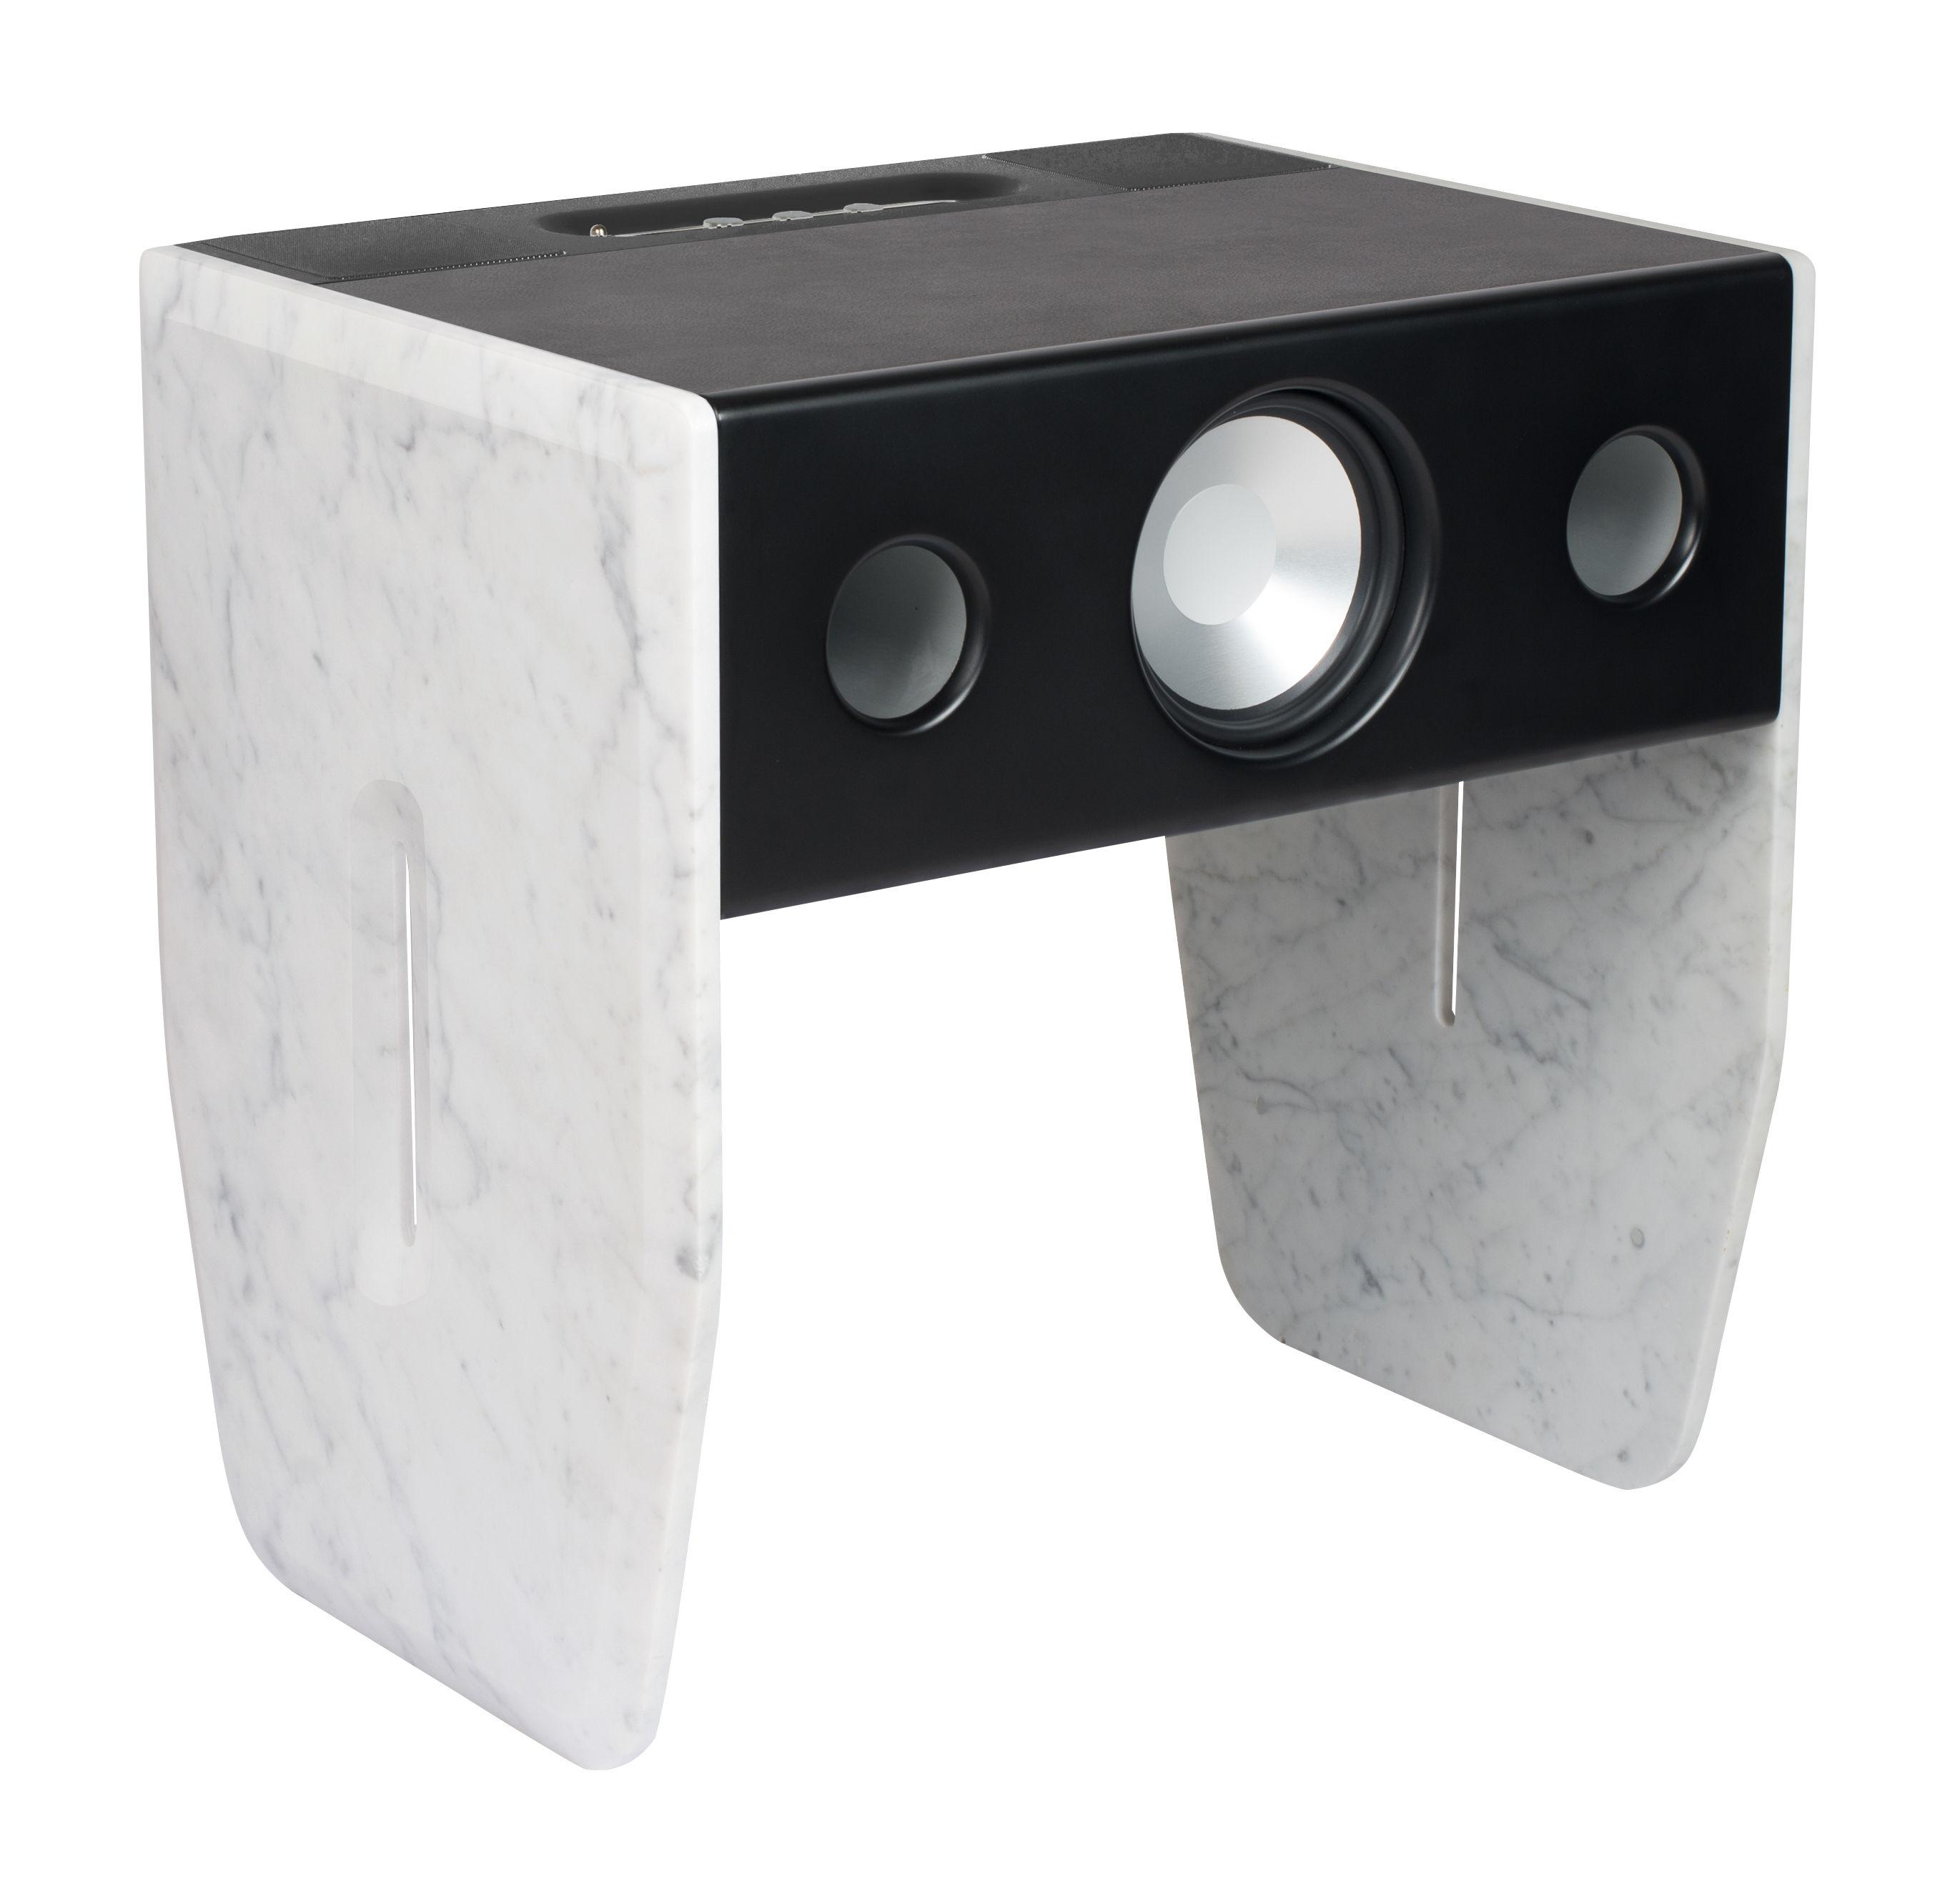 Enceinte Bluetooth Cube Marble Marbre Blanc De Carrare Marbre  # Meuble Tv Led Mdf Blanc Enceinte